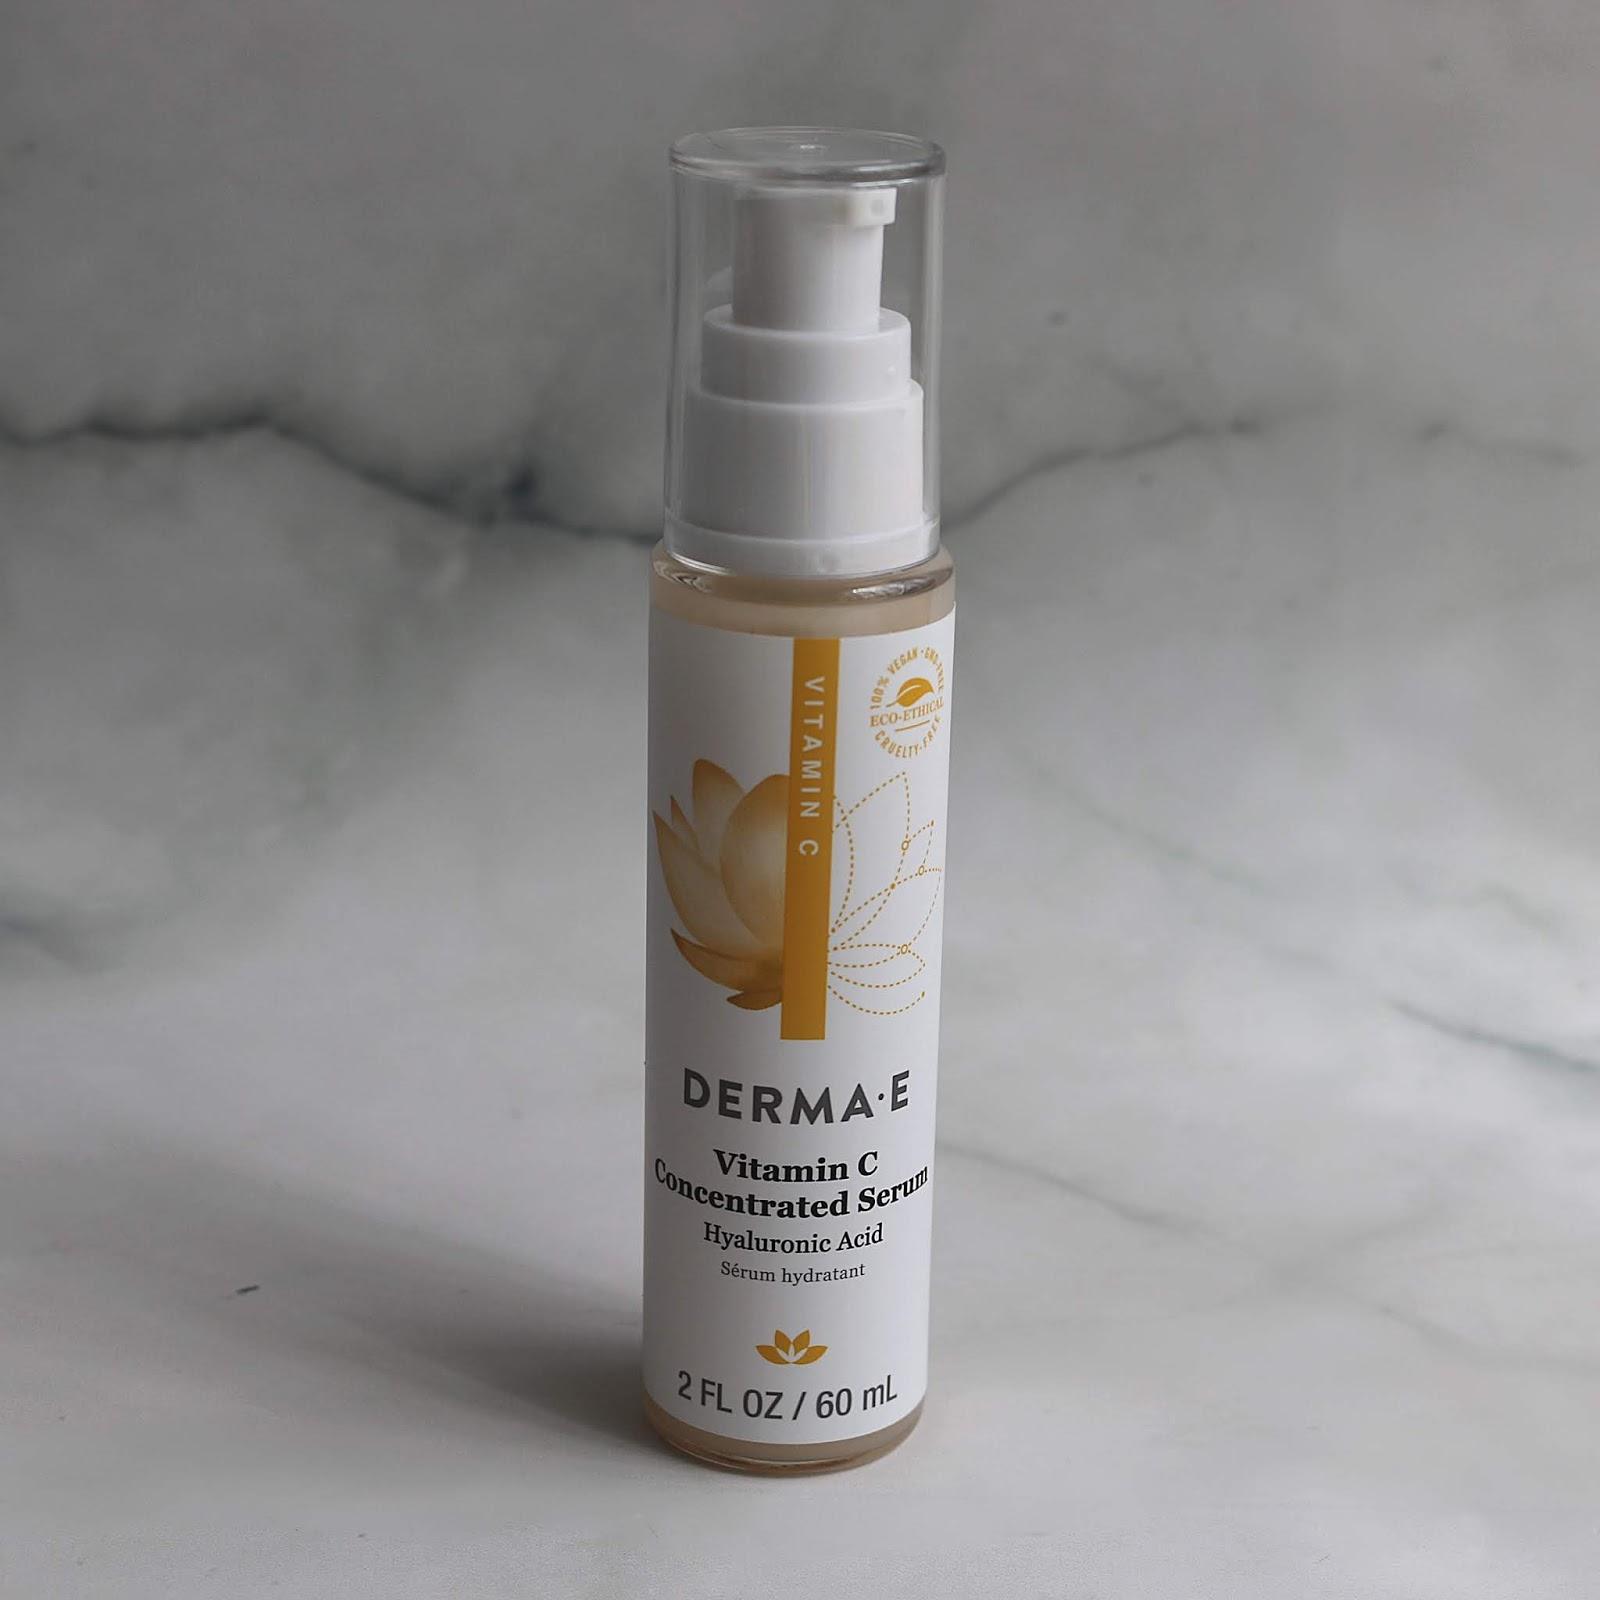 DERMA E Vitamin C Concentrated Serum Review